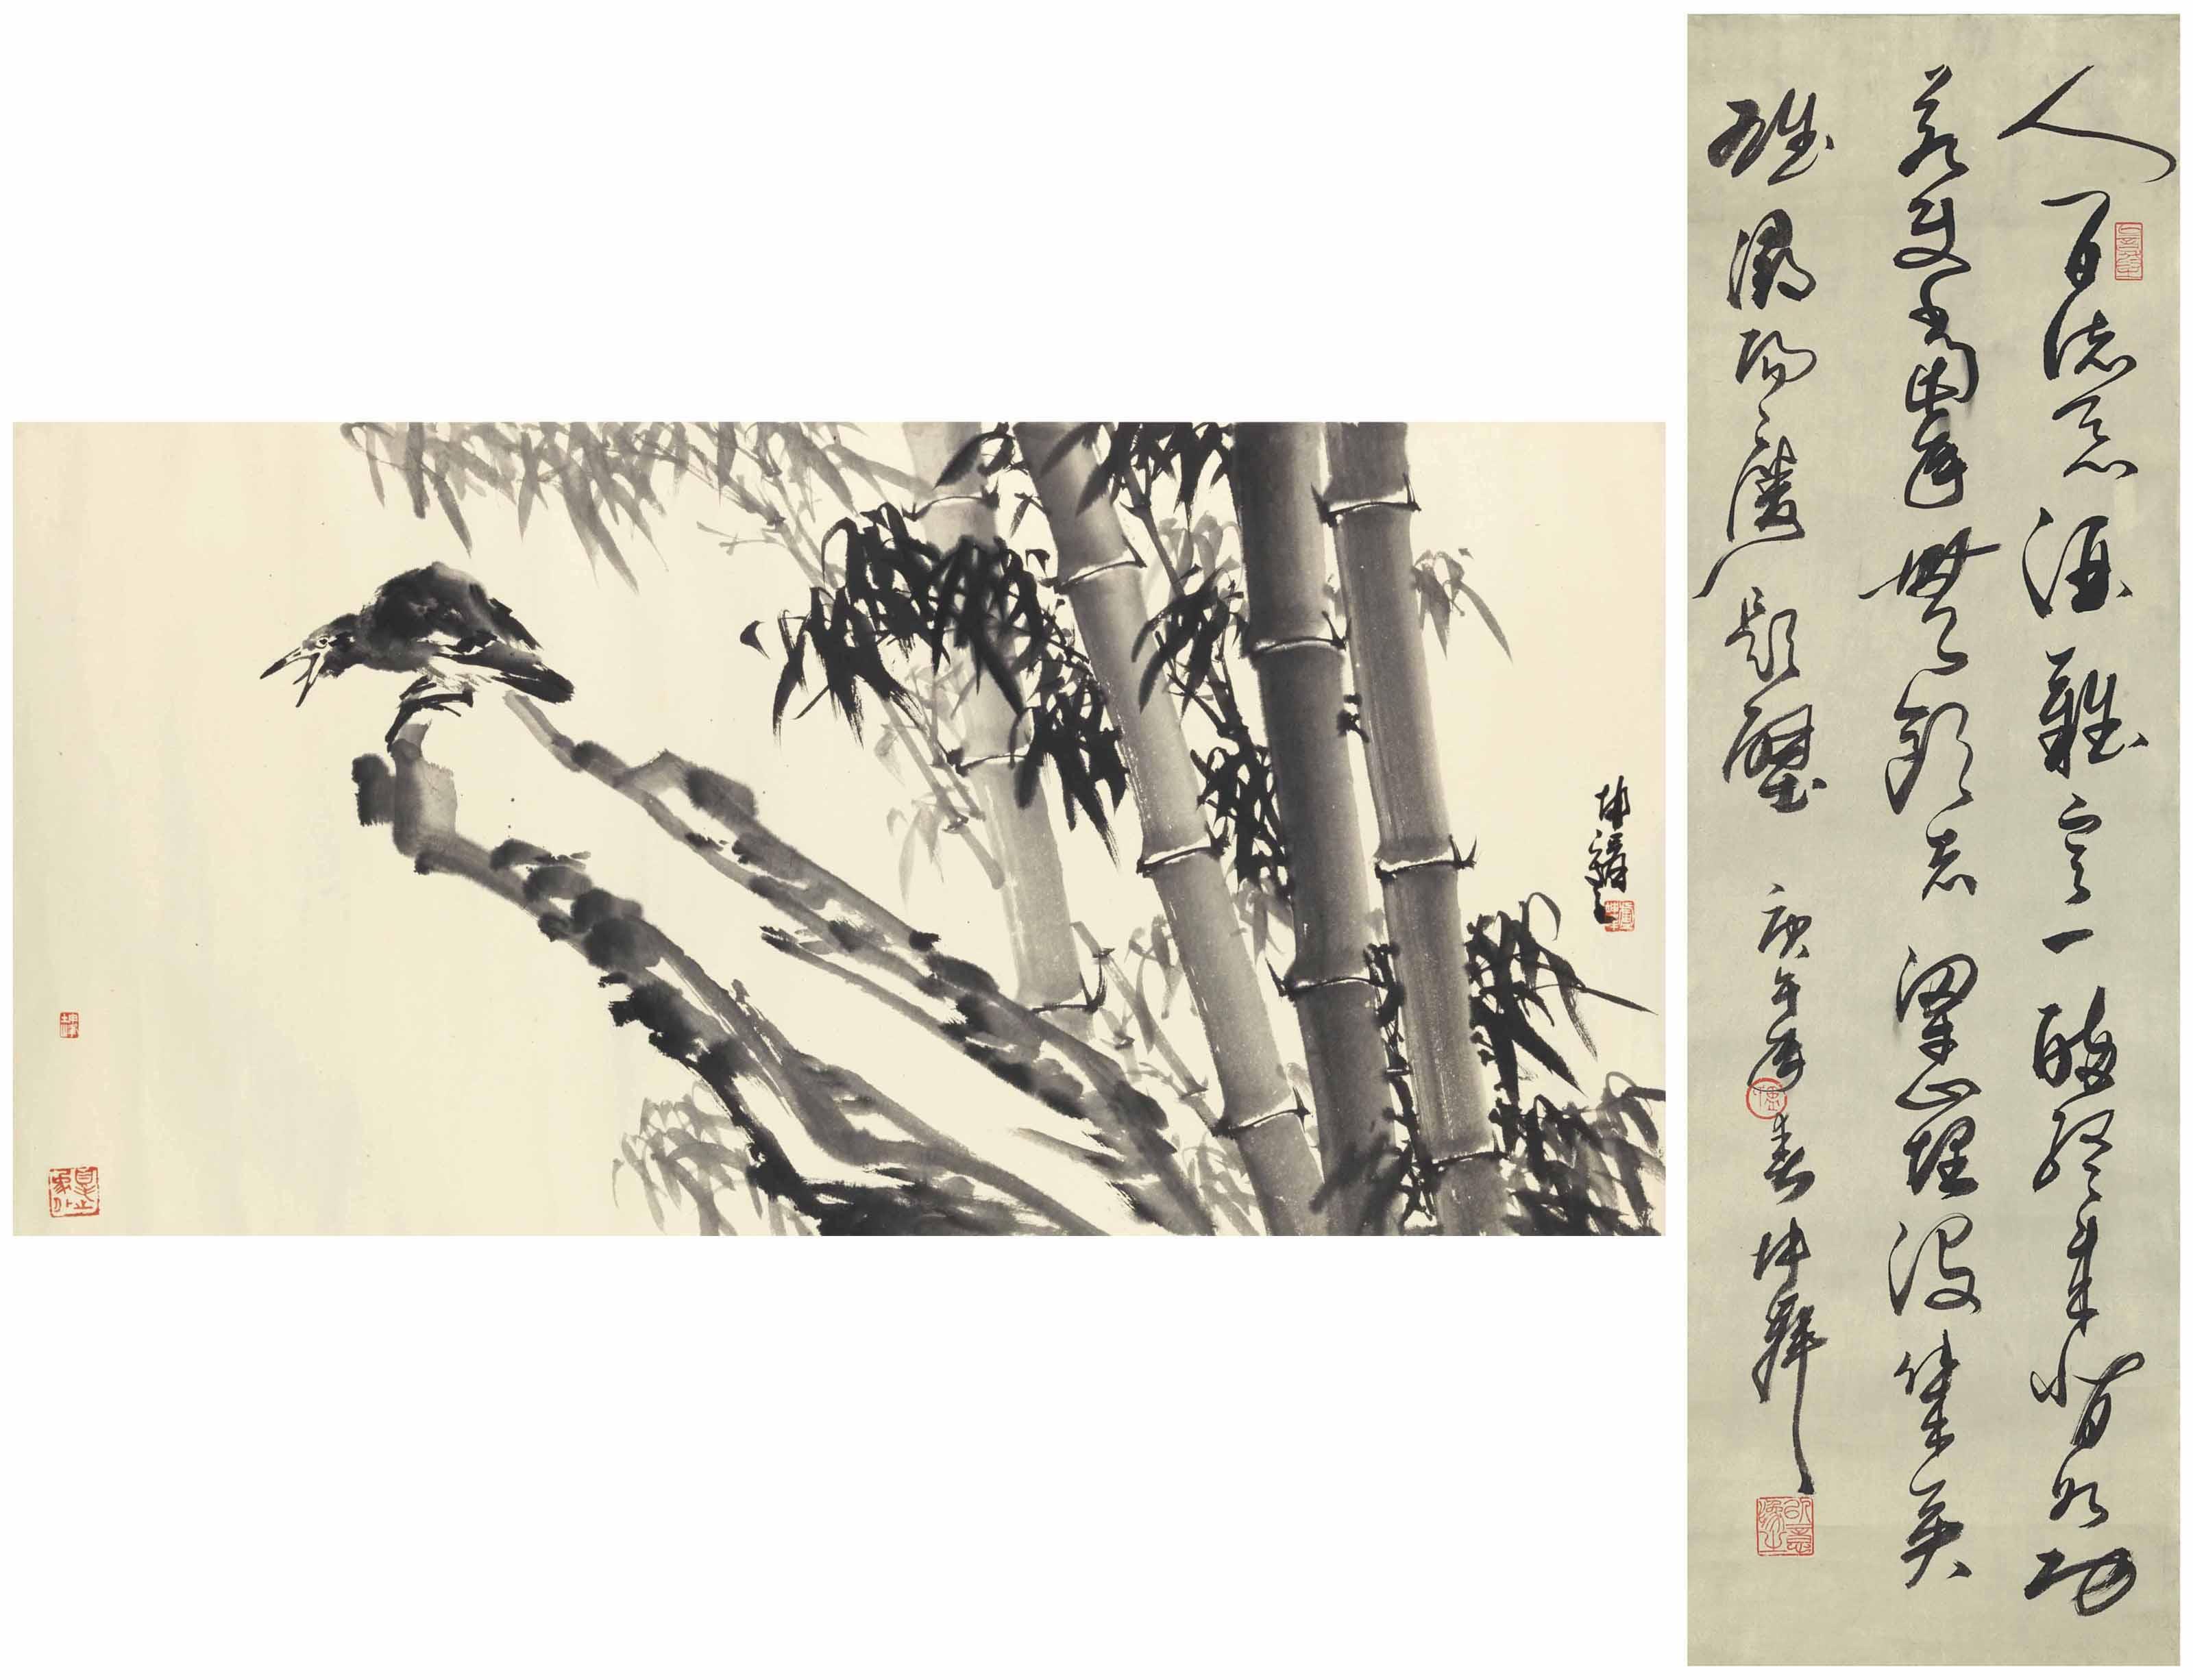 Bamboo/Calligraphy